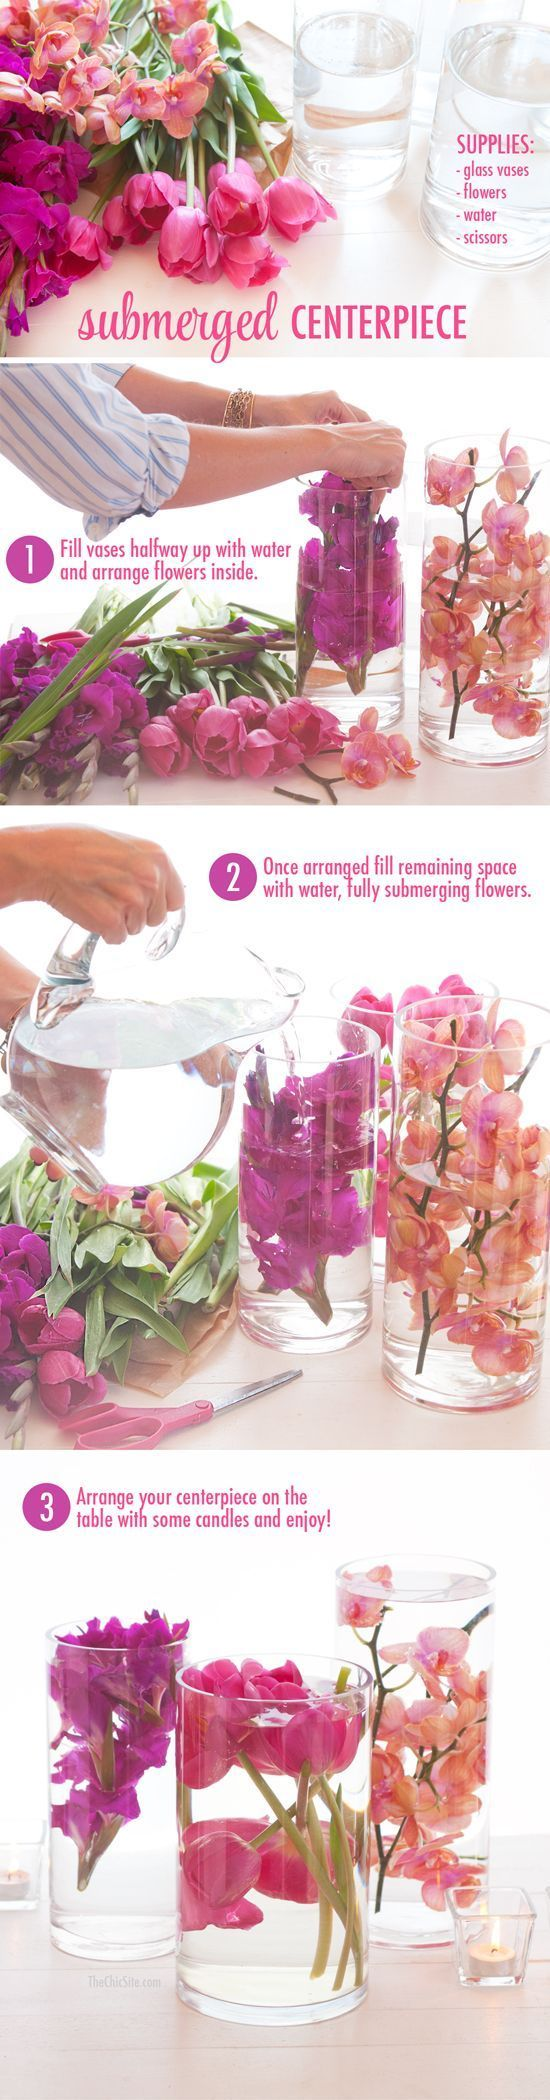 Easy wedding decorations diy   DIY Wedding Centerpieces on a Budget  Wedding centerpieces DIY